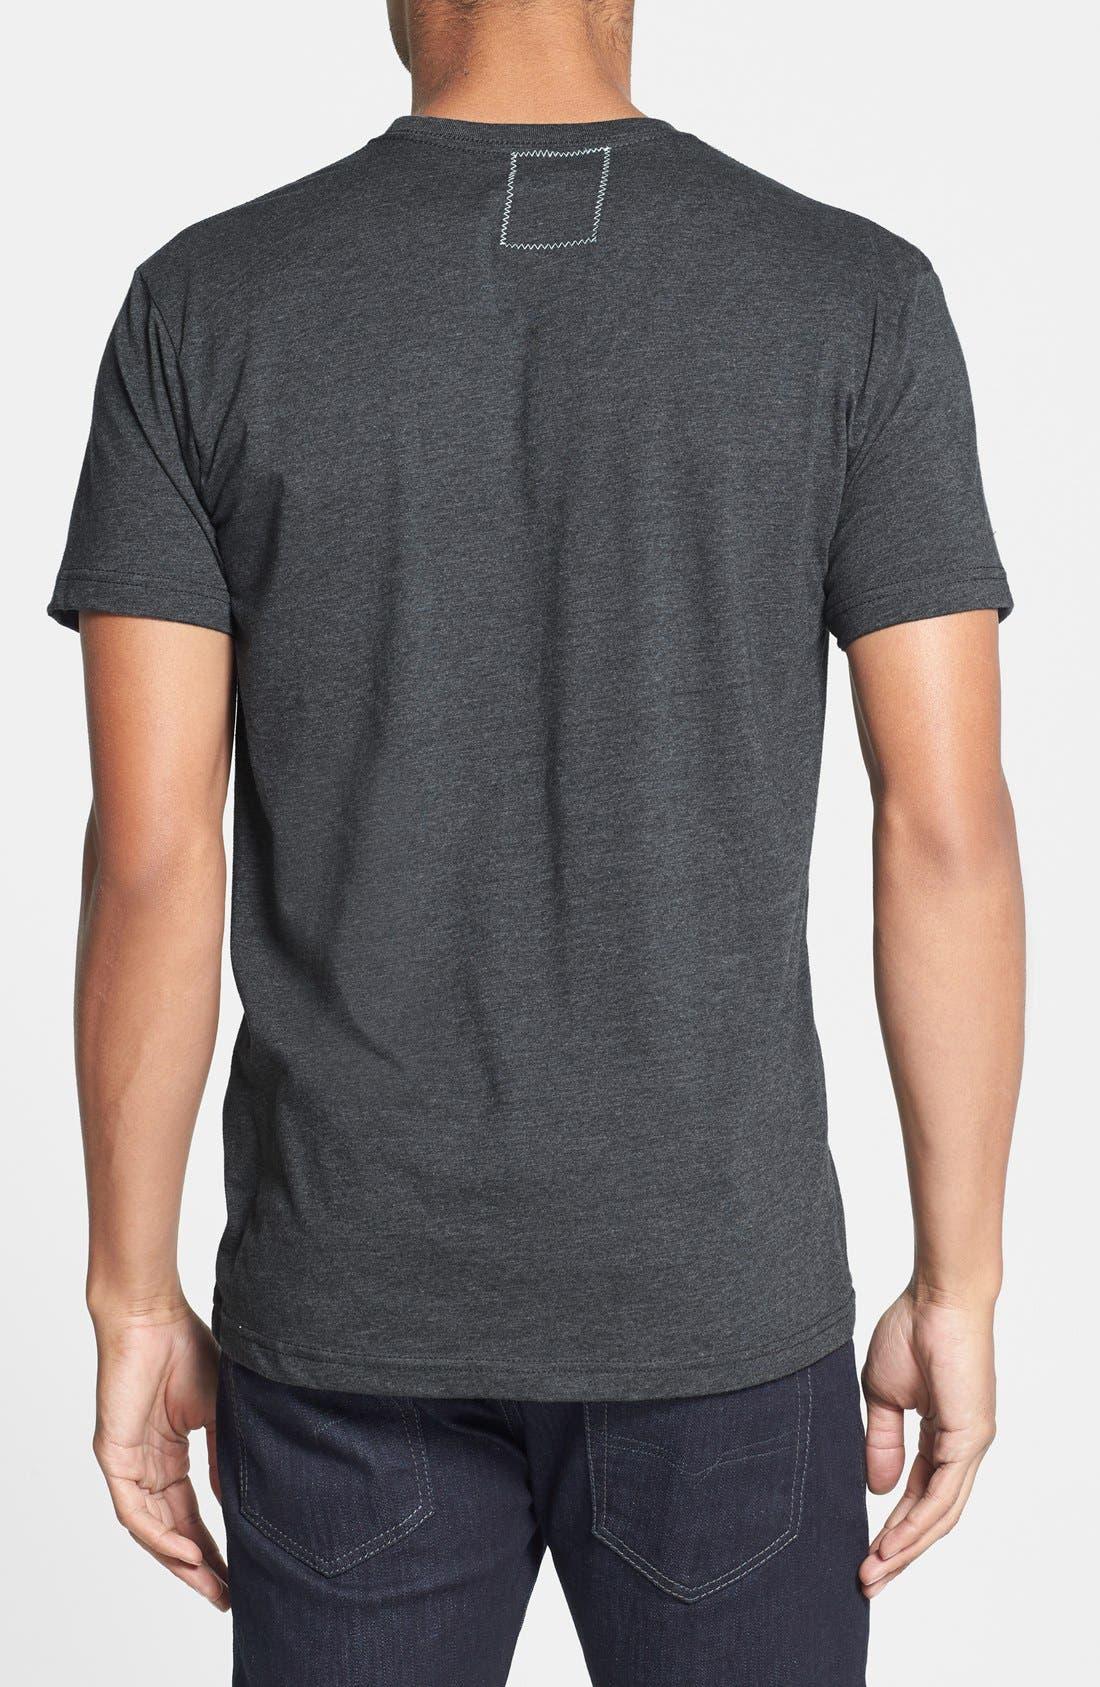 Alternate Image 2  - Kid Dangerous 'Sunday Funday' Graphic T-Shirt